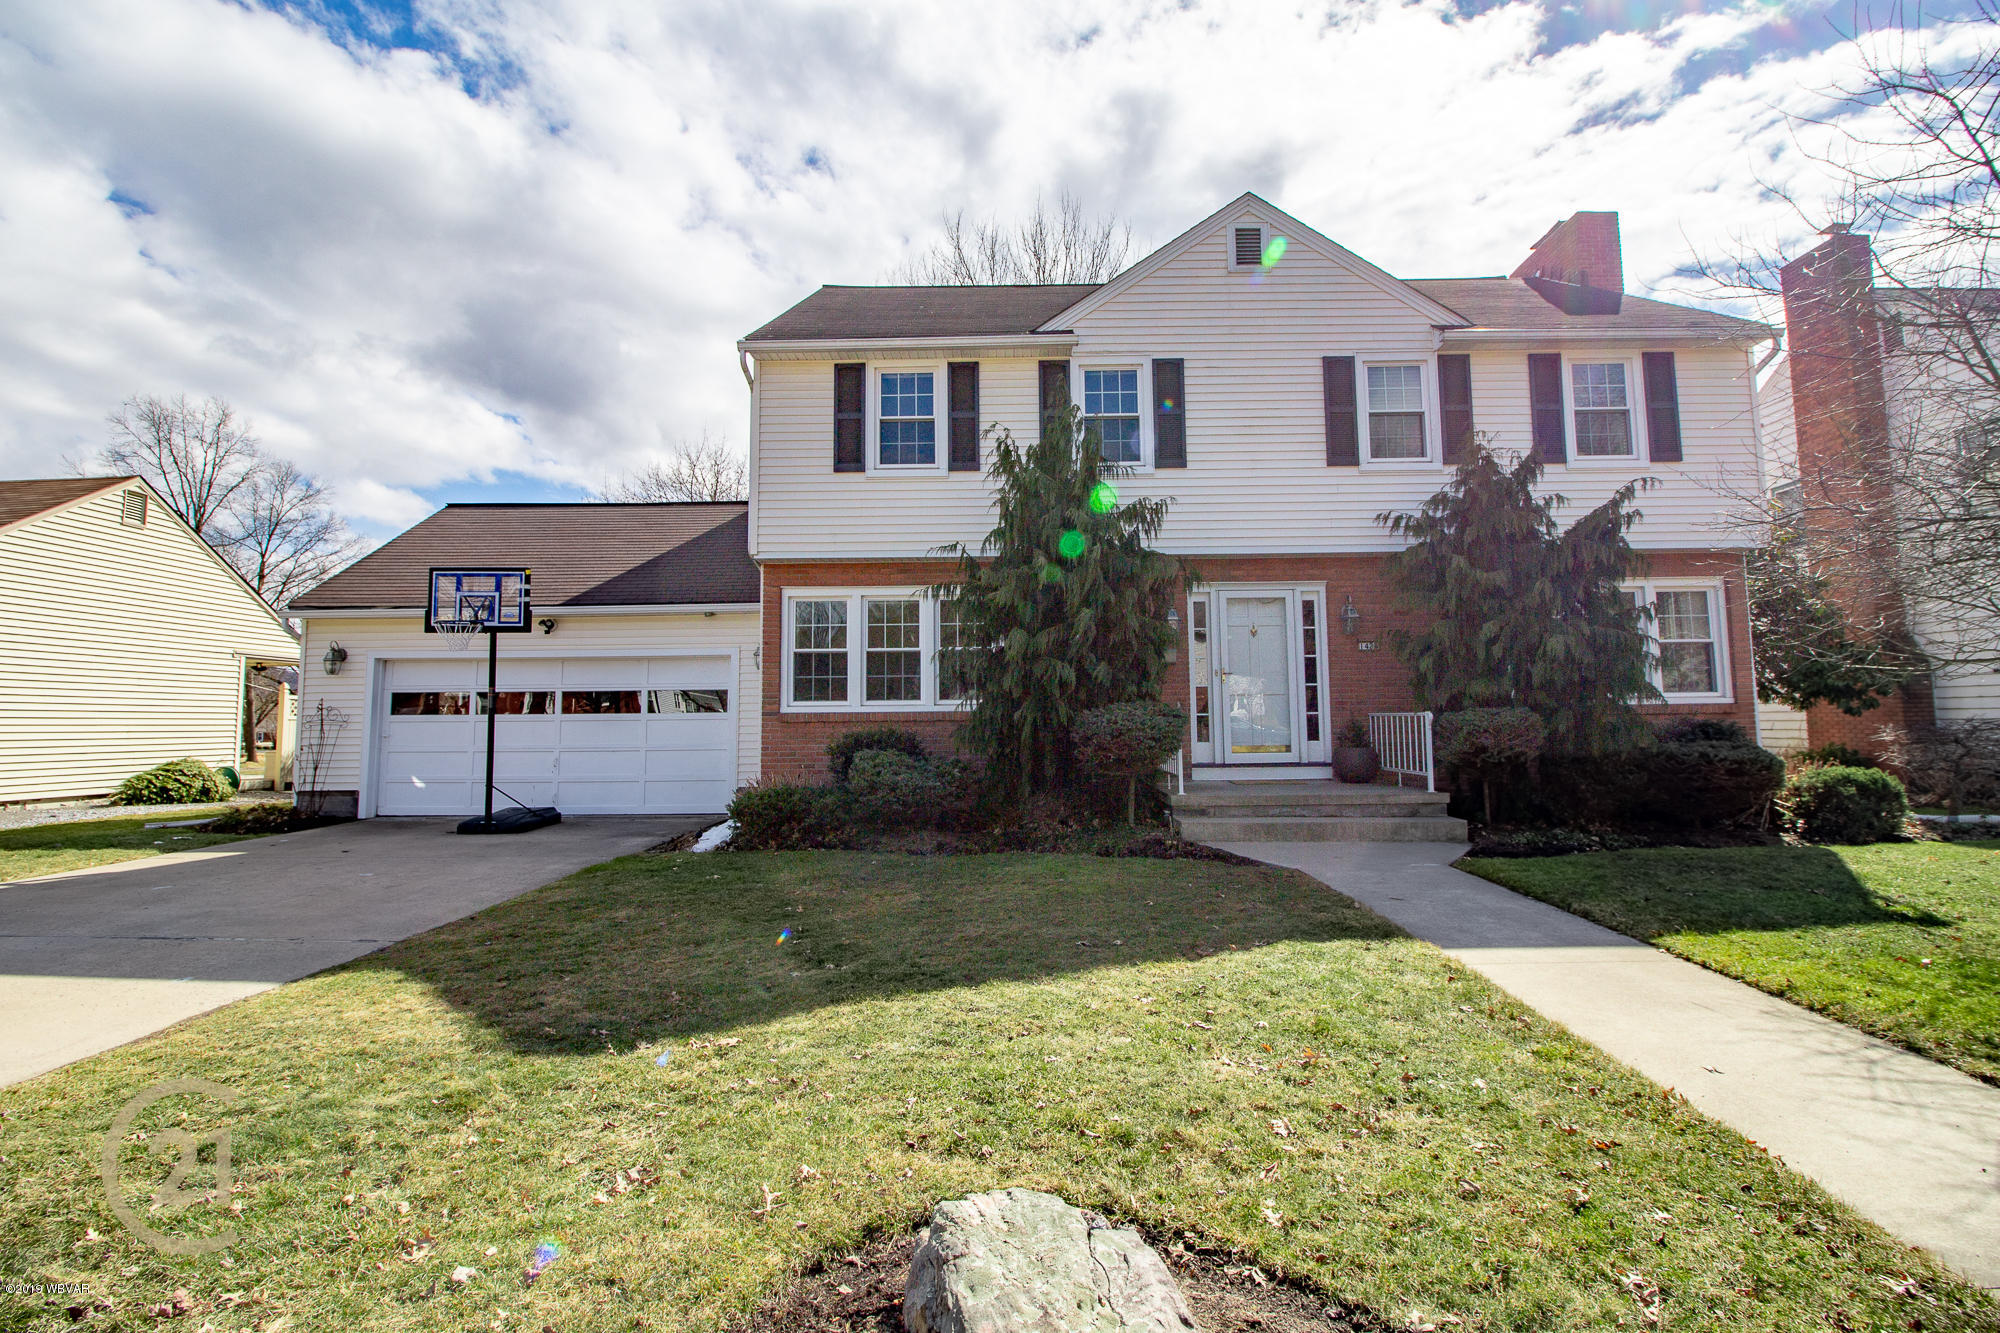 1420 HARDING AVENUE,Williamsport,PA 17701,4 Bedrooms Bedrooms,3 BathroomsBathrooms,Residential,HARDING,WB-86681